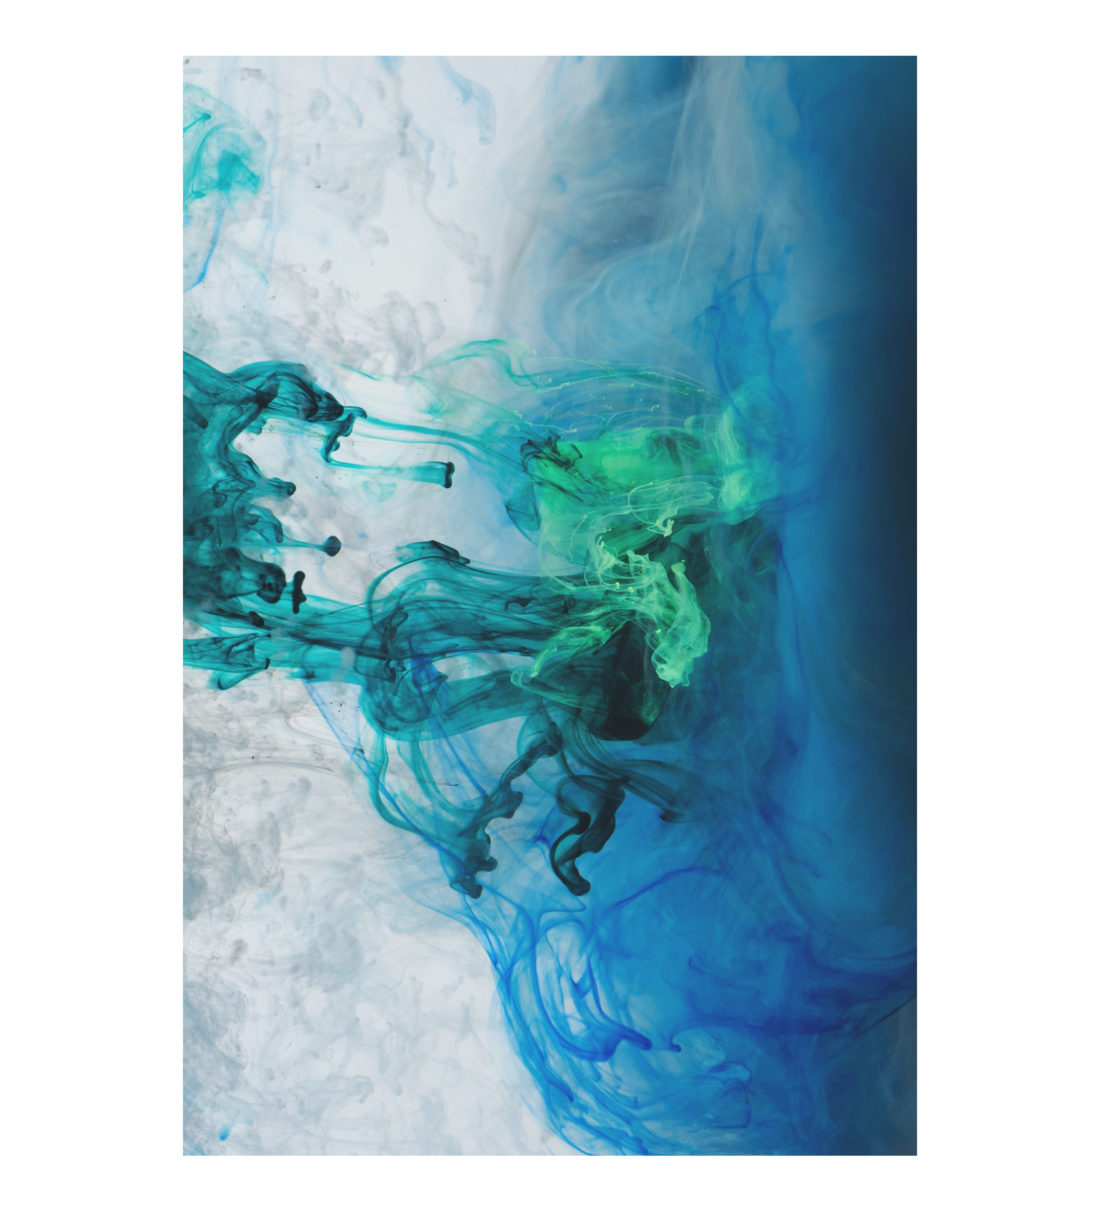 Afterlife / Enrico Policardo